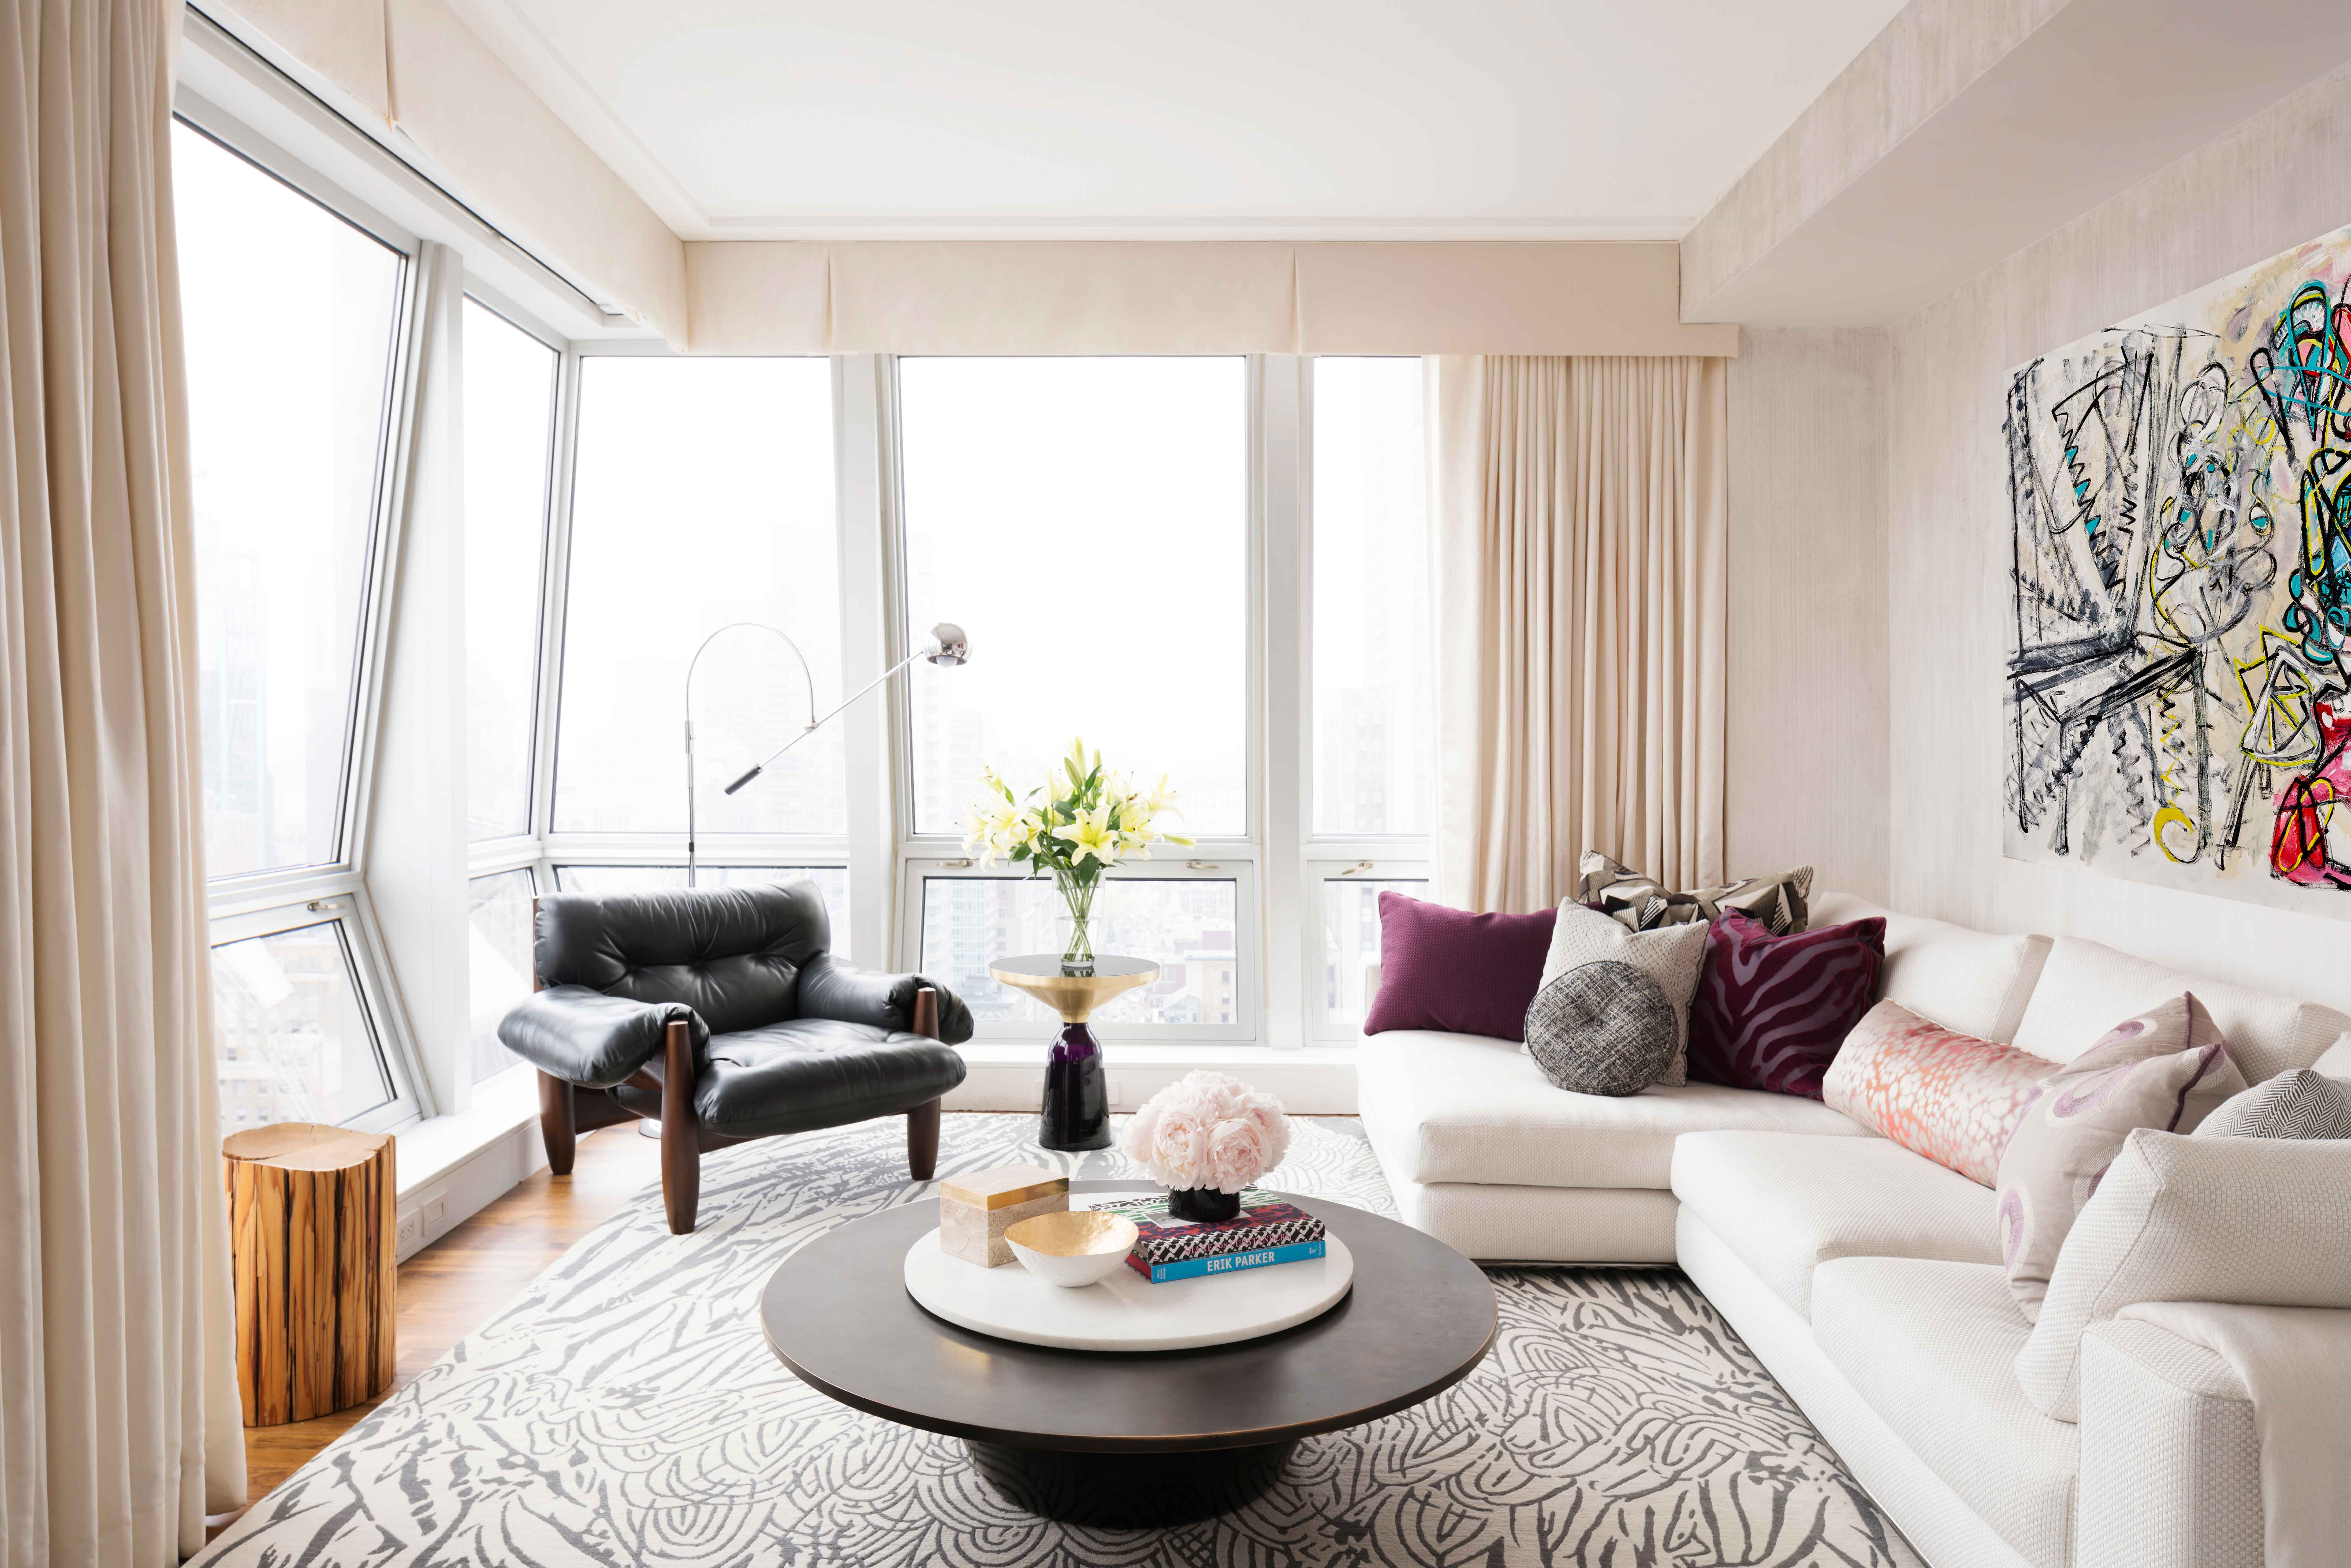 Nicole-Fuller-Interior-Designer-lower-5th-ave-pied-living-room-6